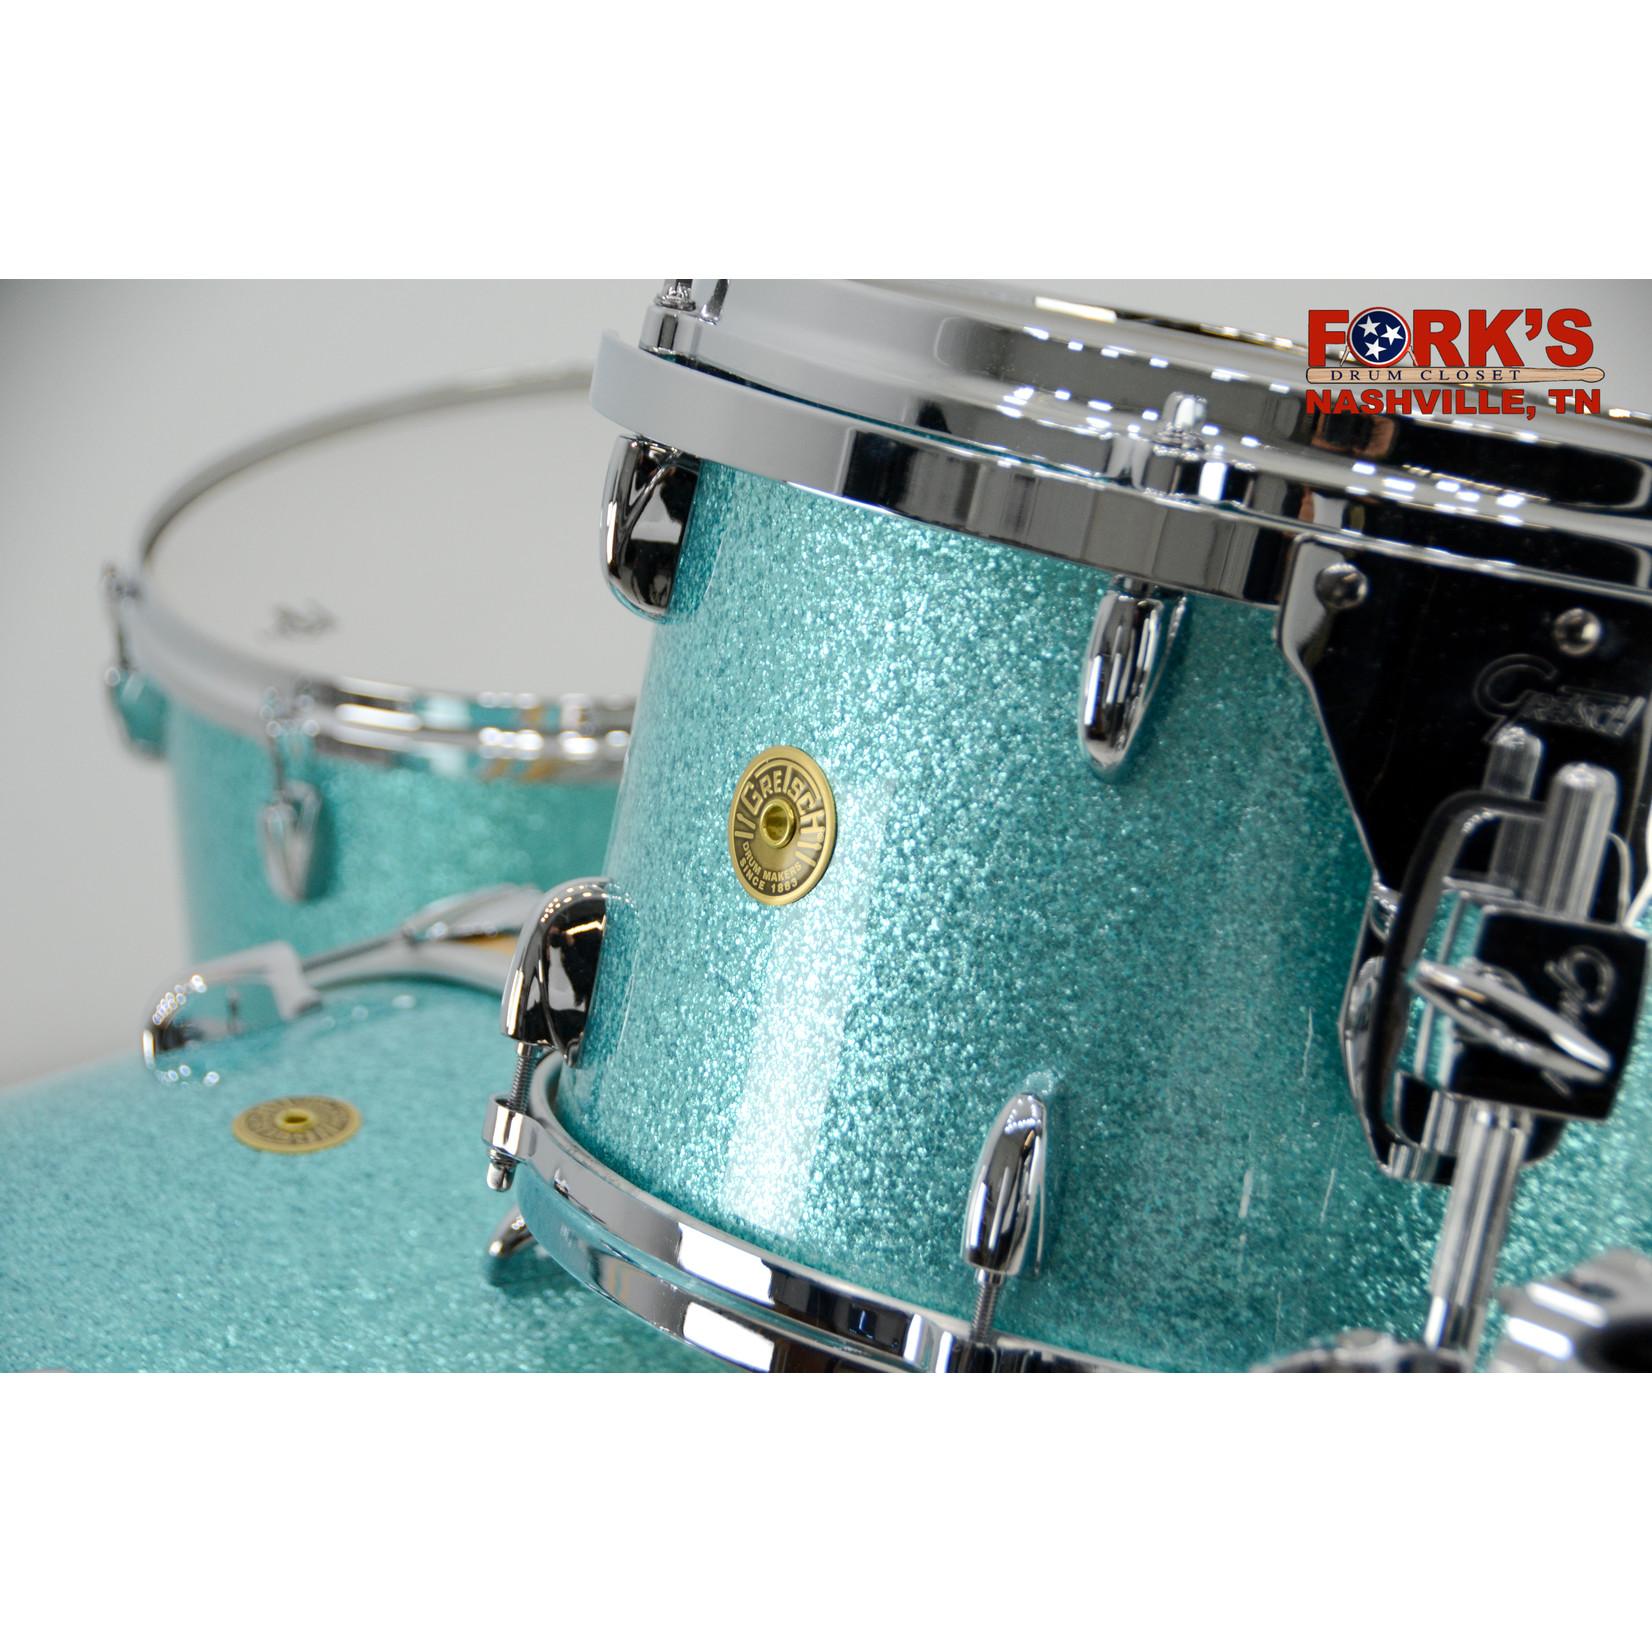 "Gretsch Gretsch USA 3pc Drum Set ""Turquoise Glass"""